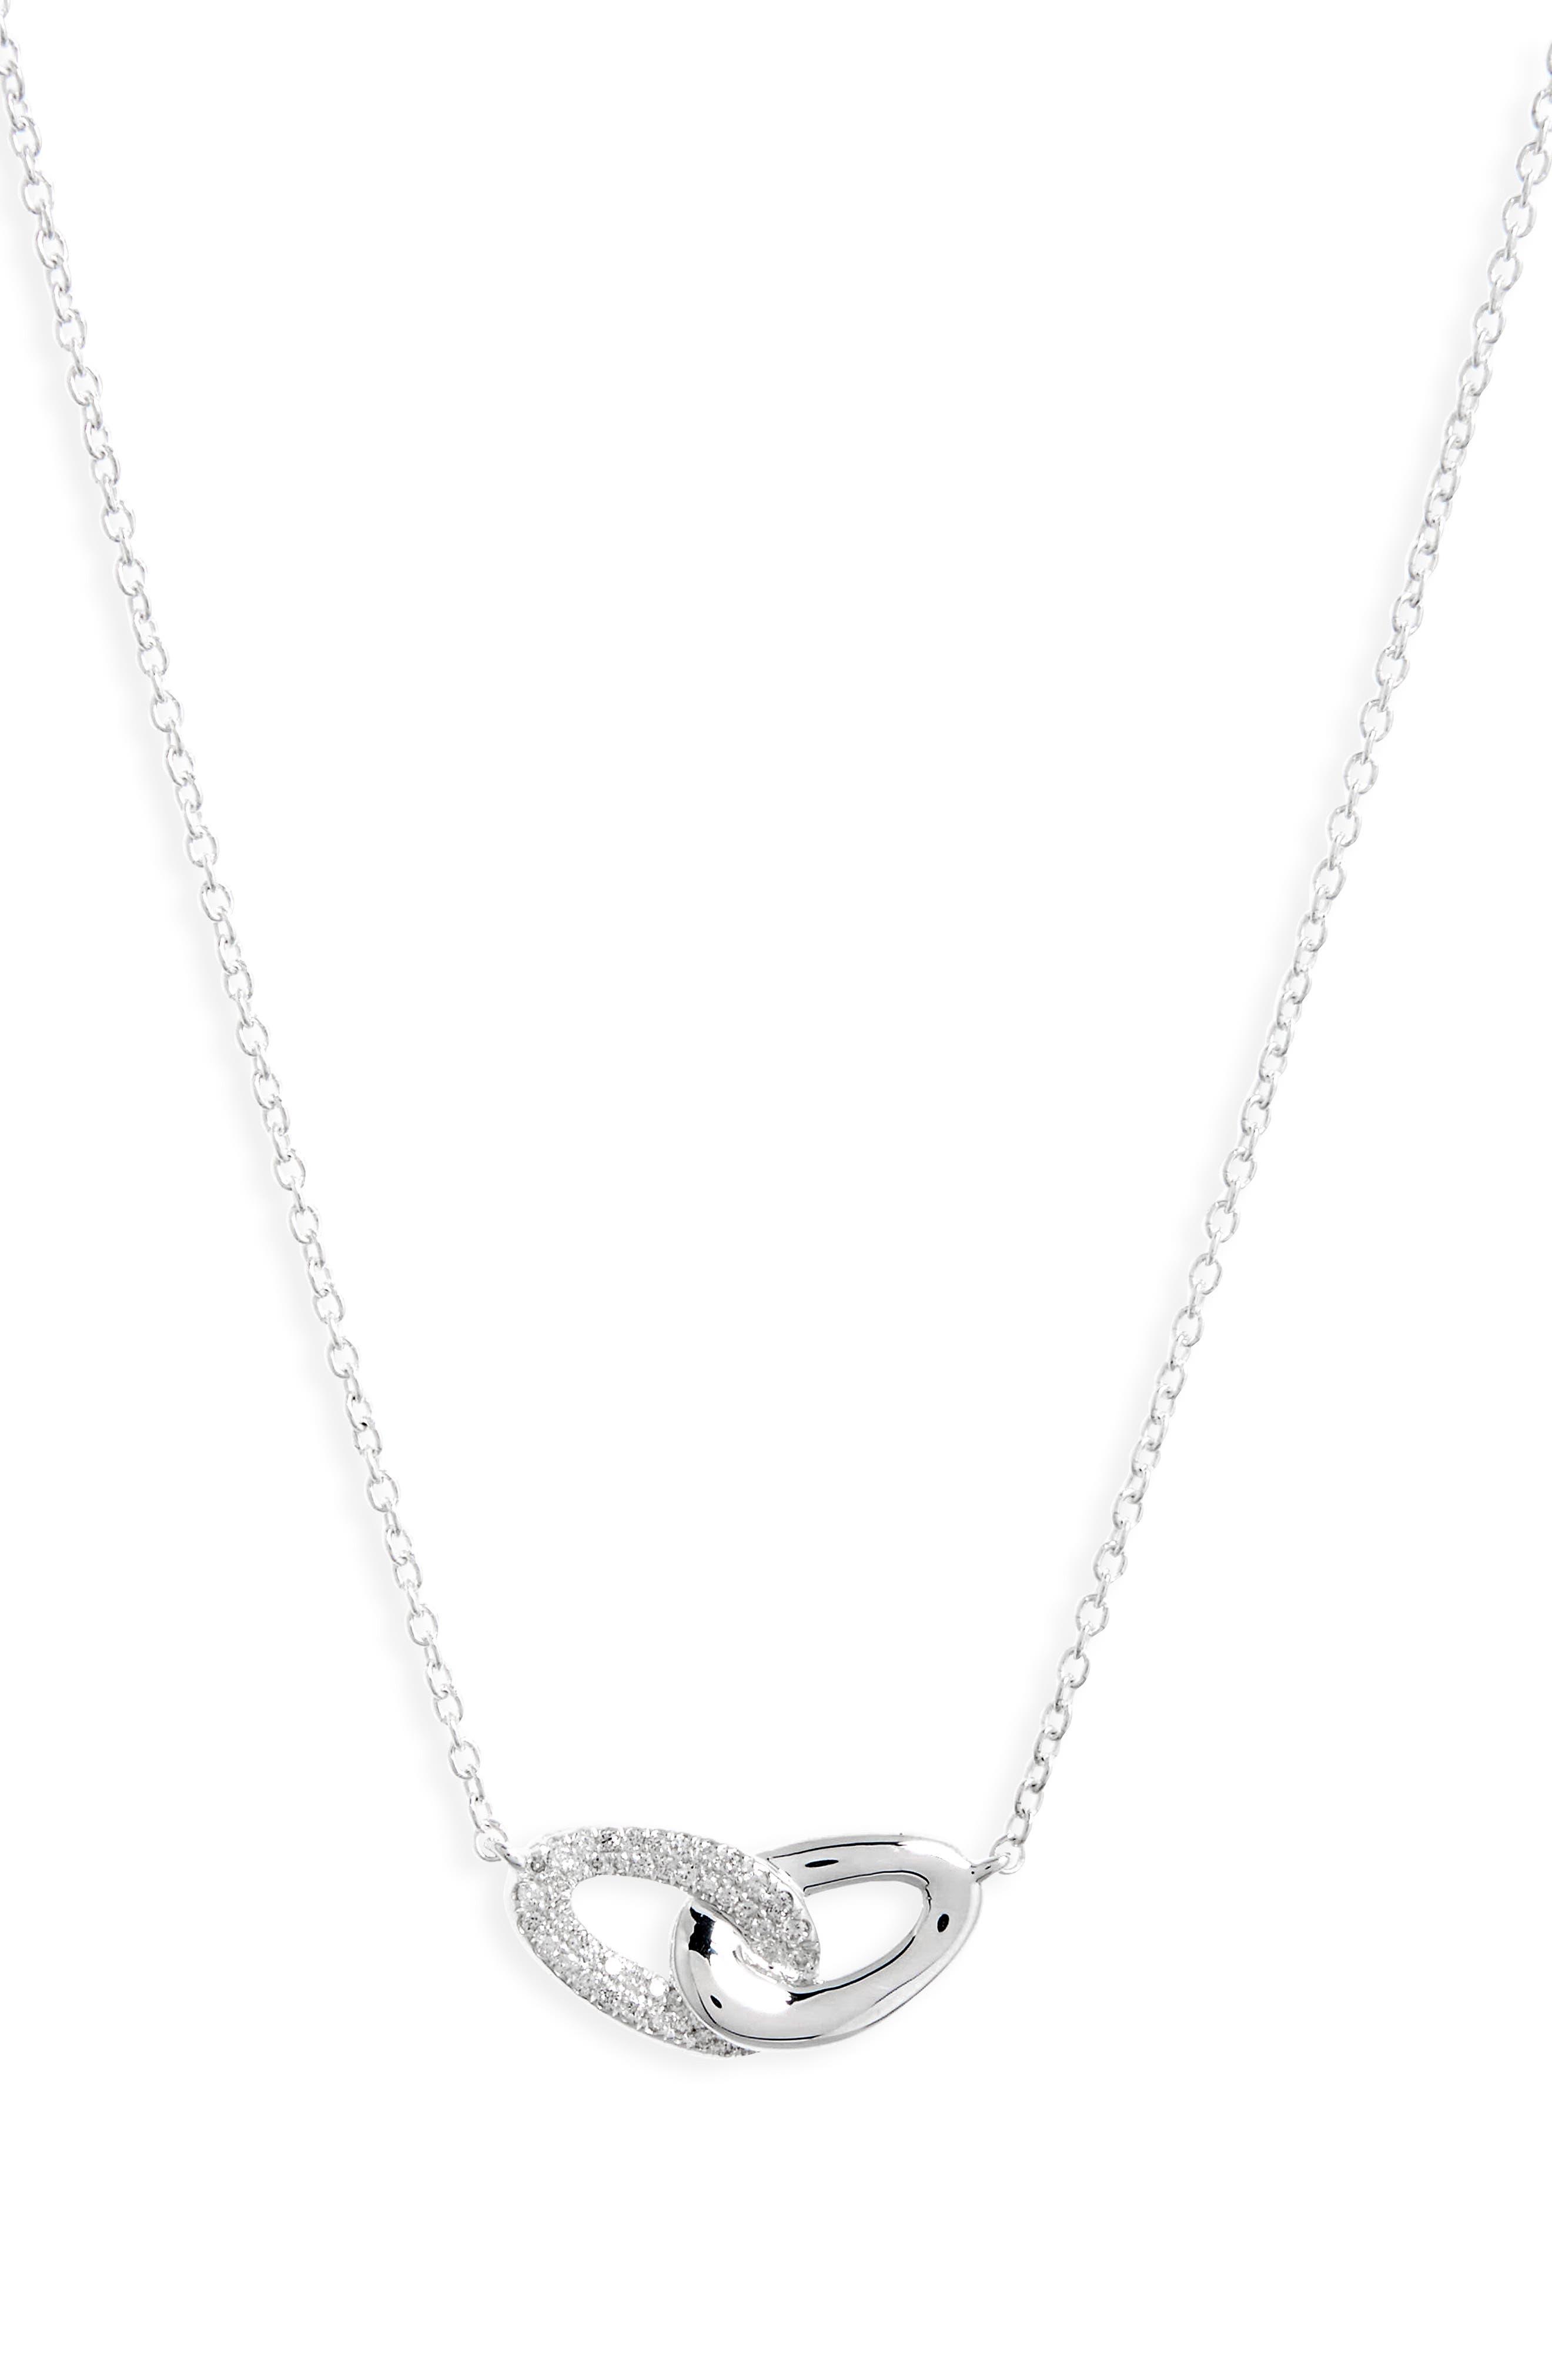 Main Image - Ippolita Cherish Interlocking Pendant Necklace